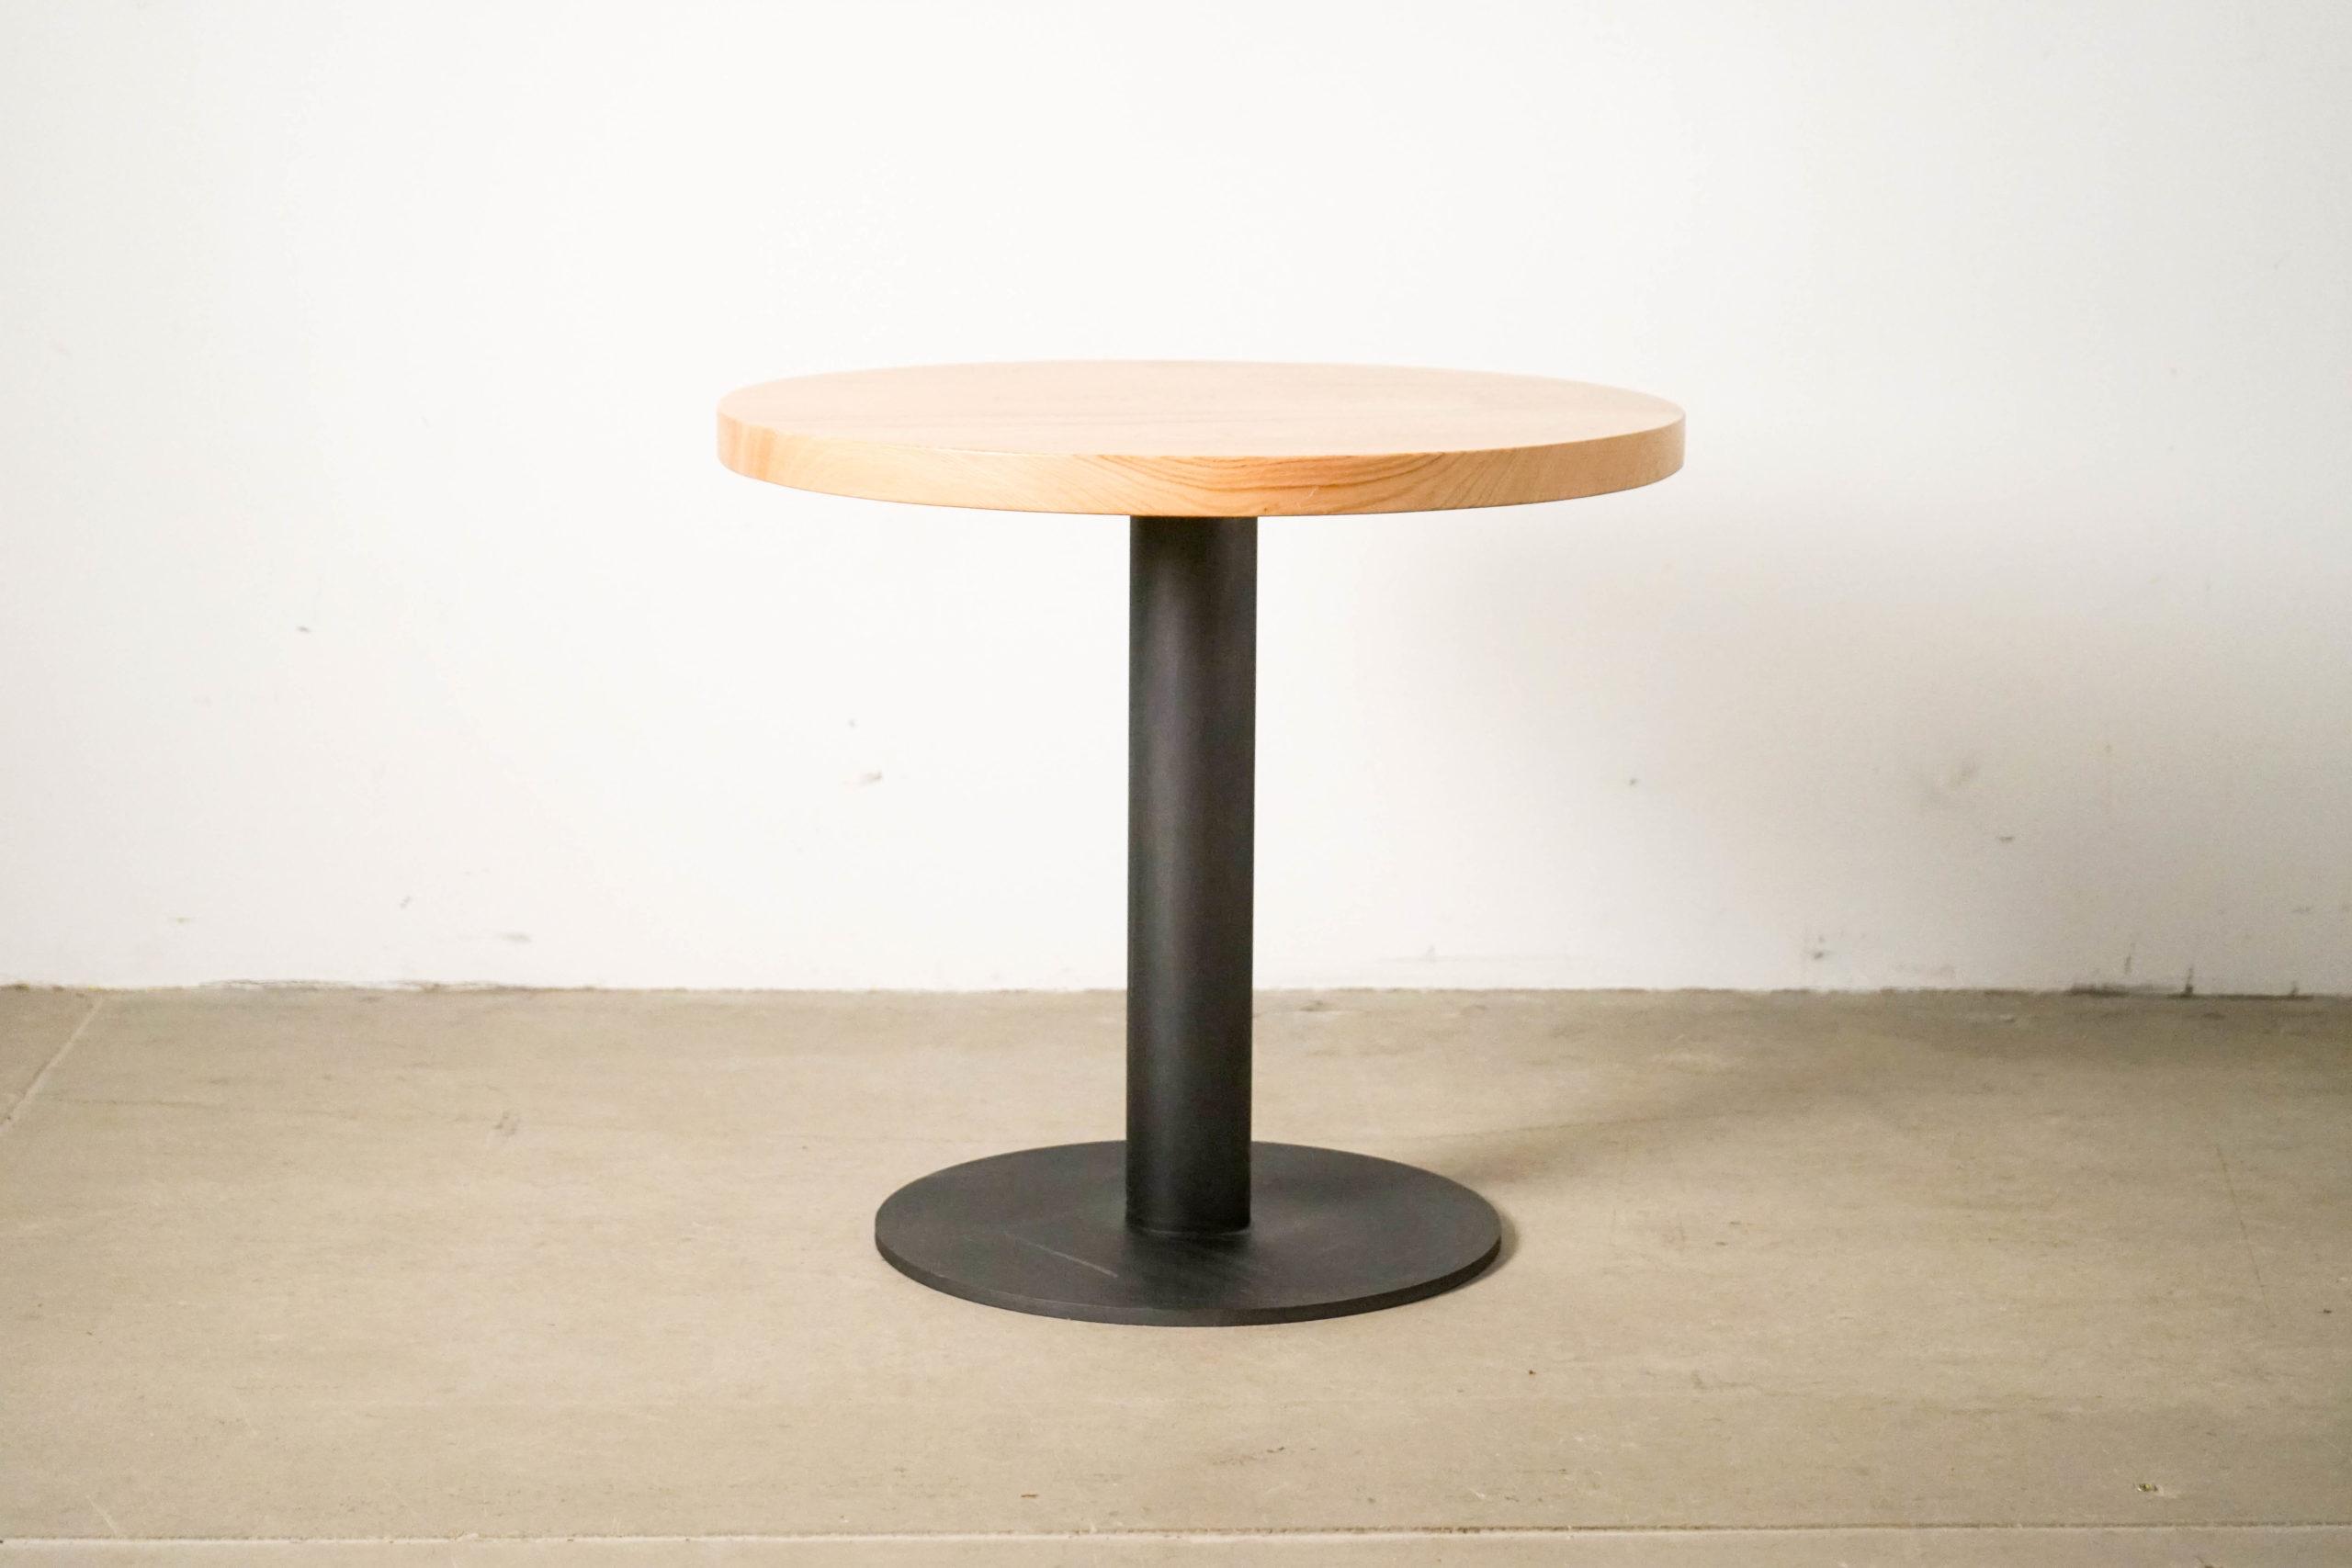 mesa de hosteleria de castaño hecha a mano